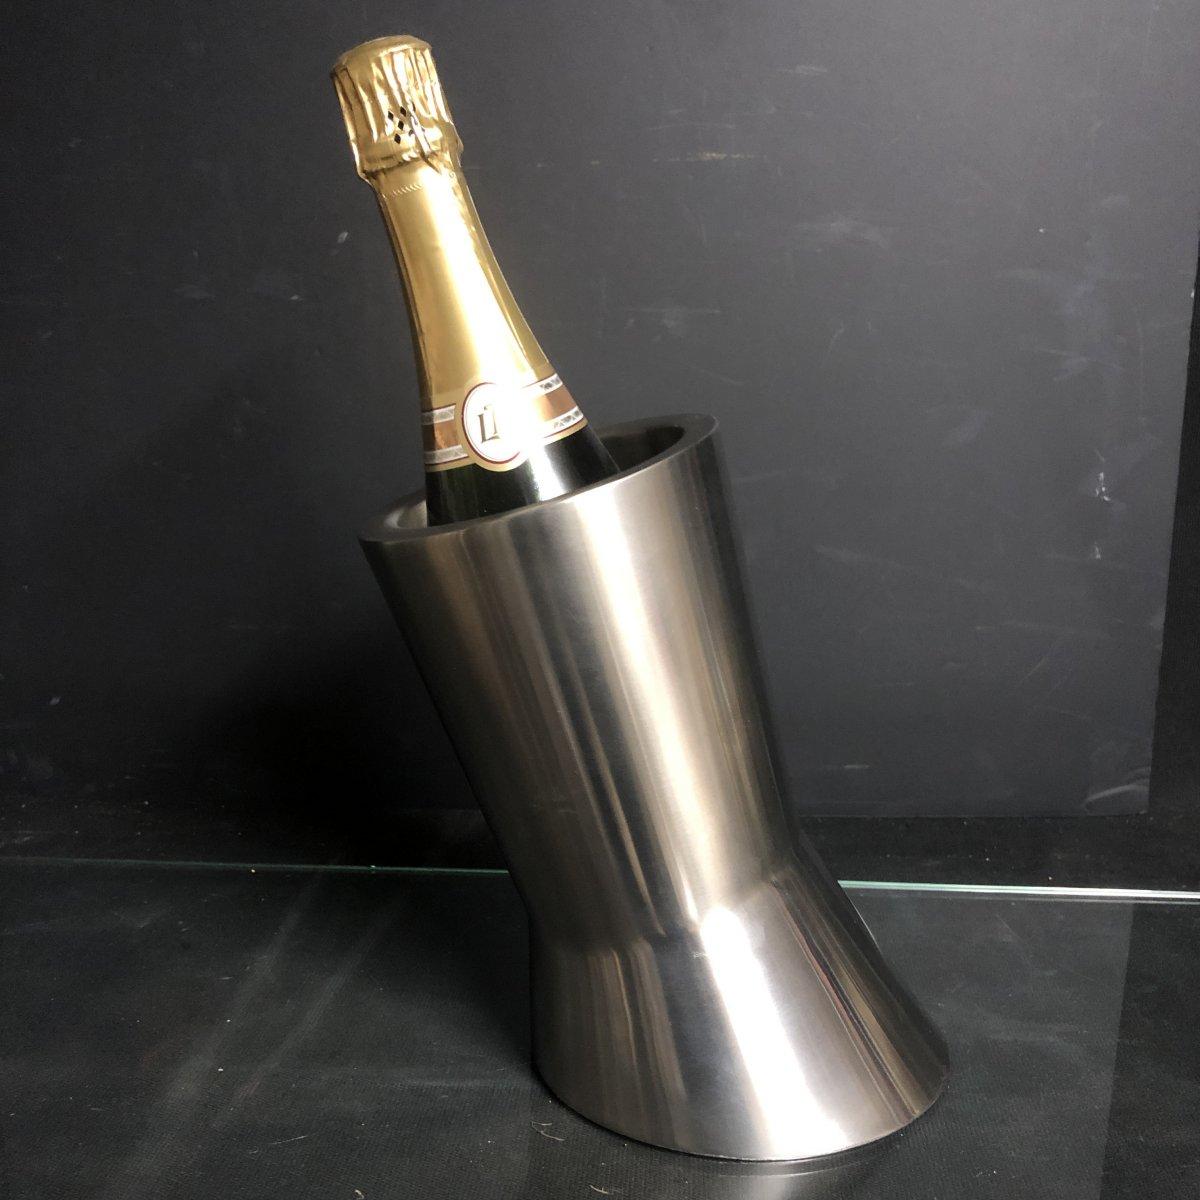 Seau à champagne Design en aluminium brossé rafraîchissoir 1970-photo-5